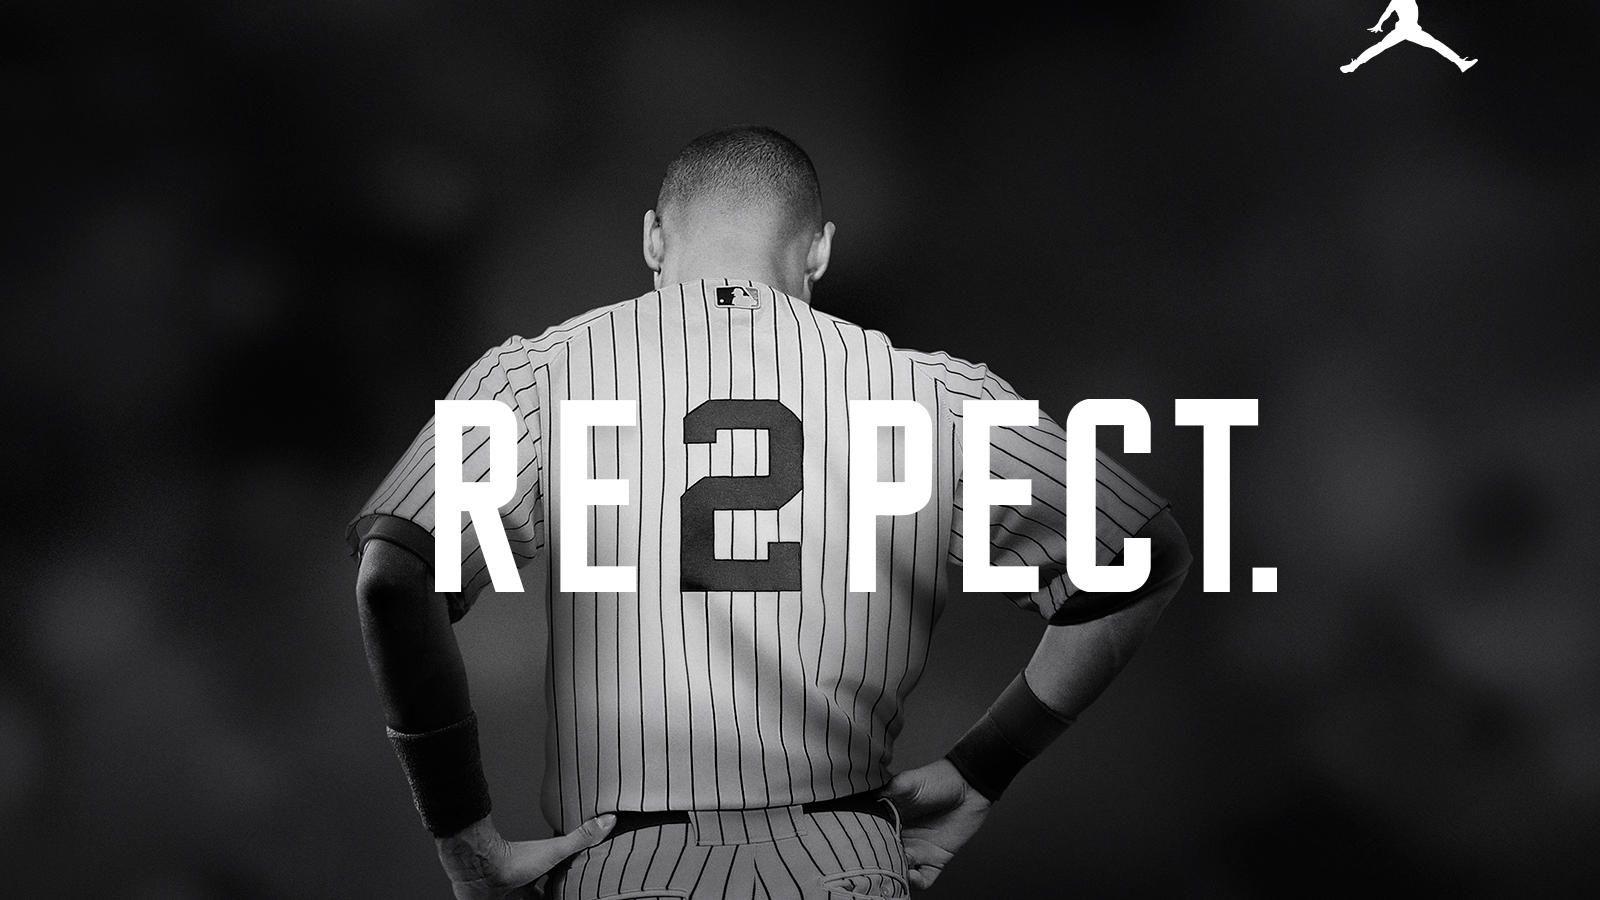 Nike Baseball Wallpaper Hd Resolution Baseball Wallpaper Baseball Baseball Shirts